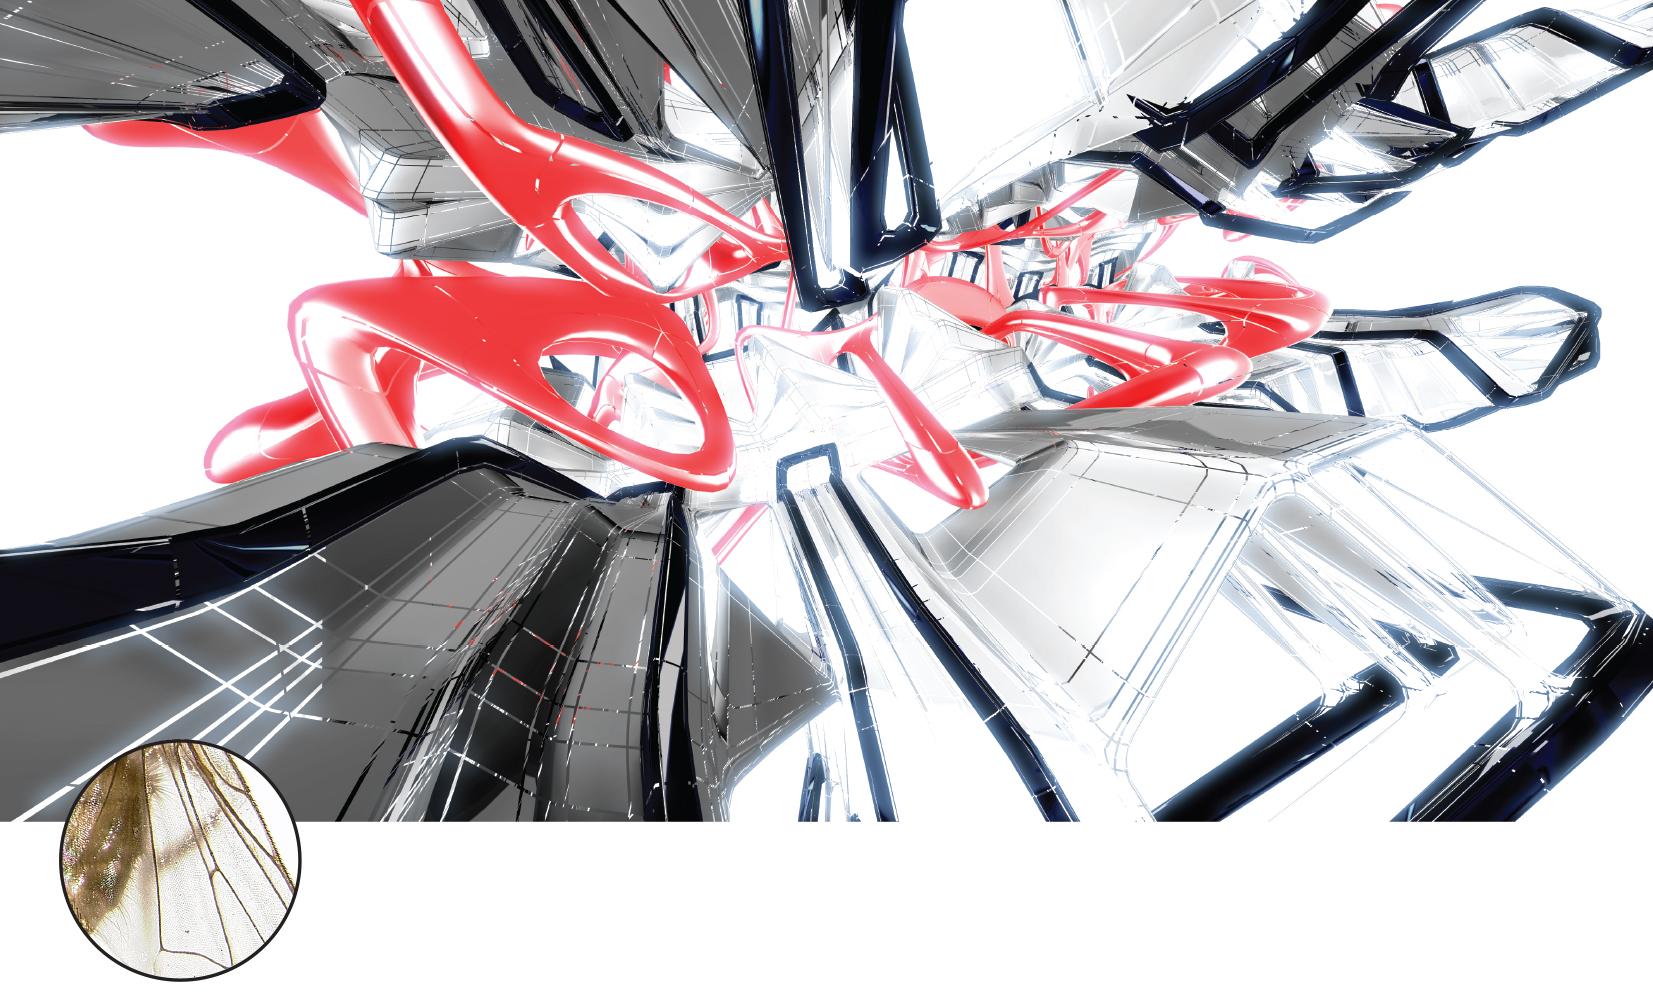 Flori_Kryethi_compiled-25 copy.jpg